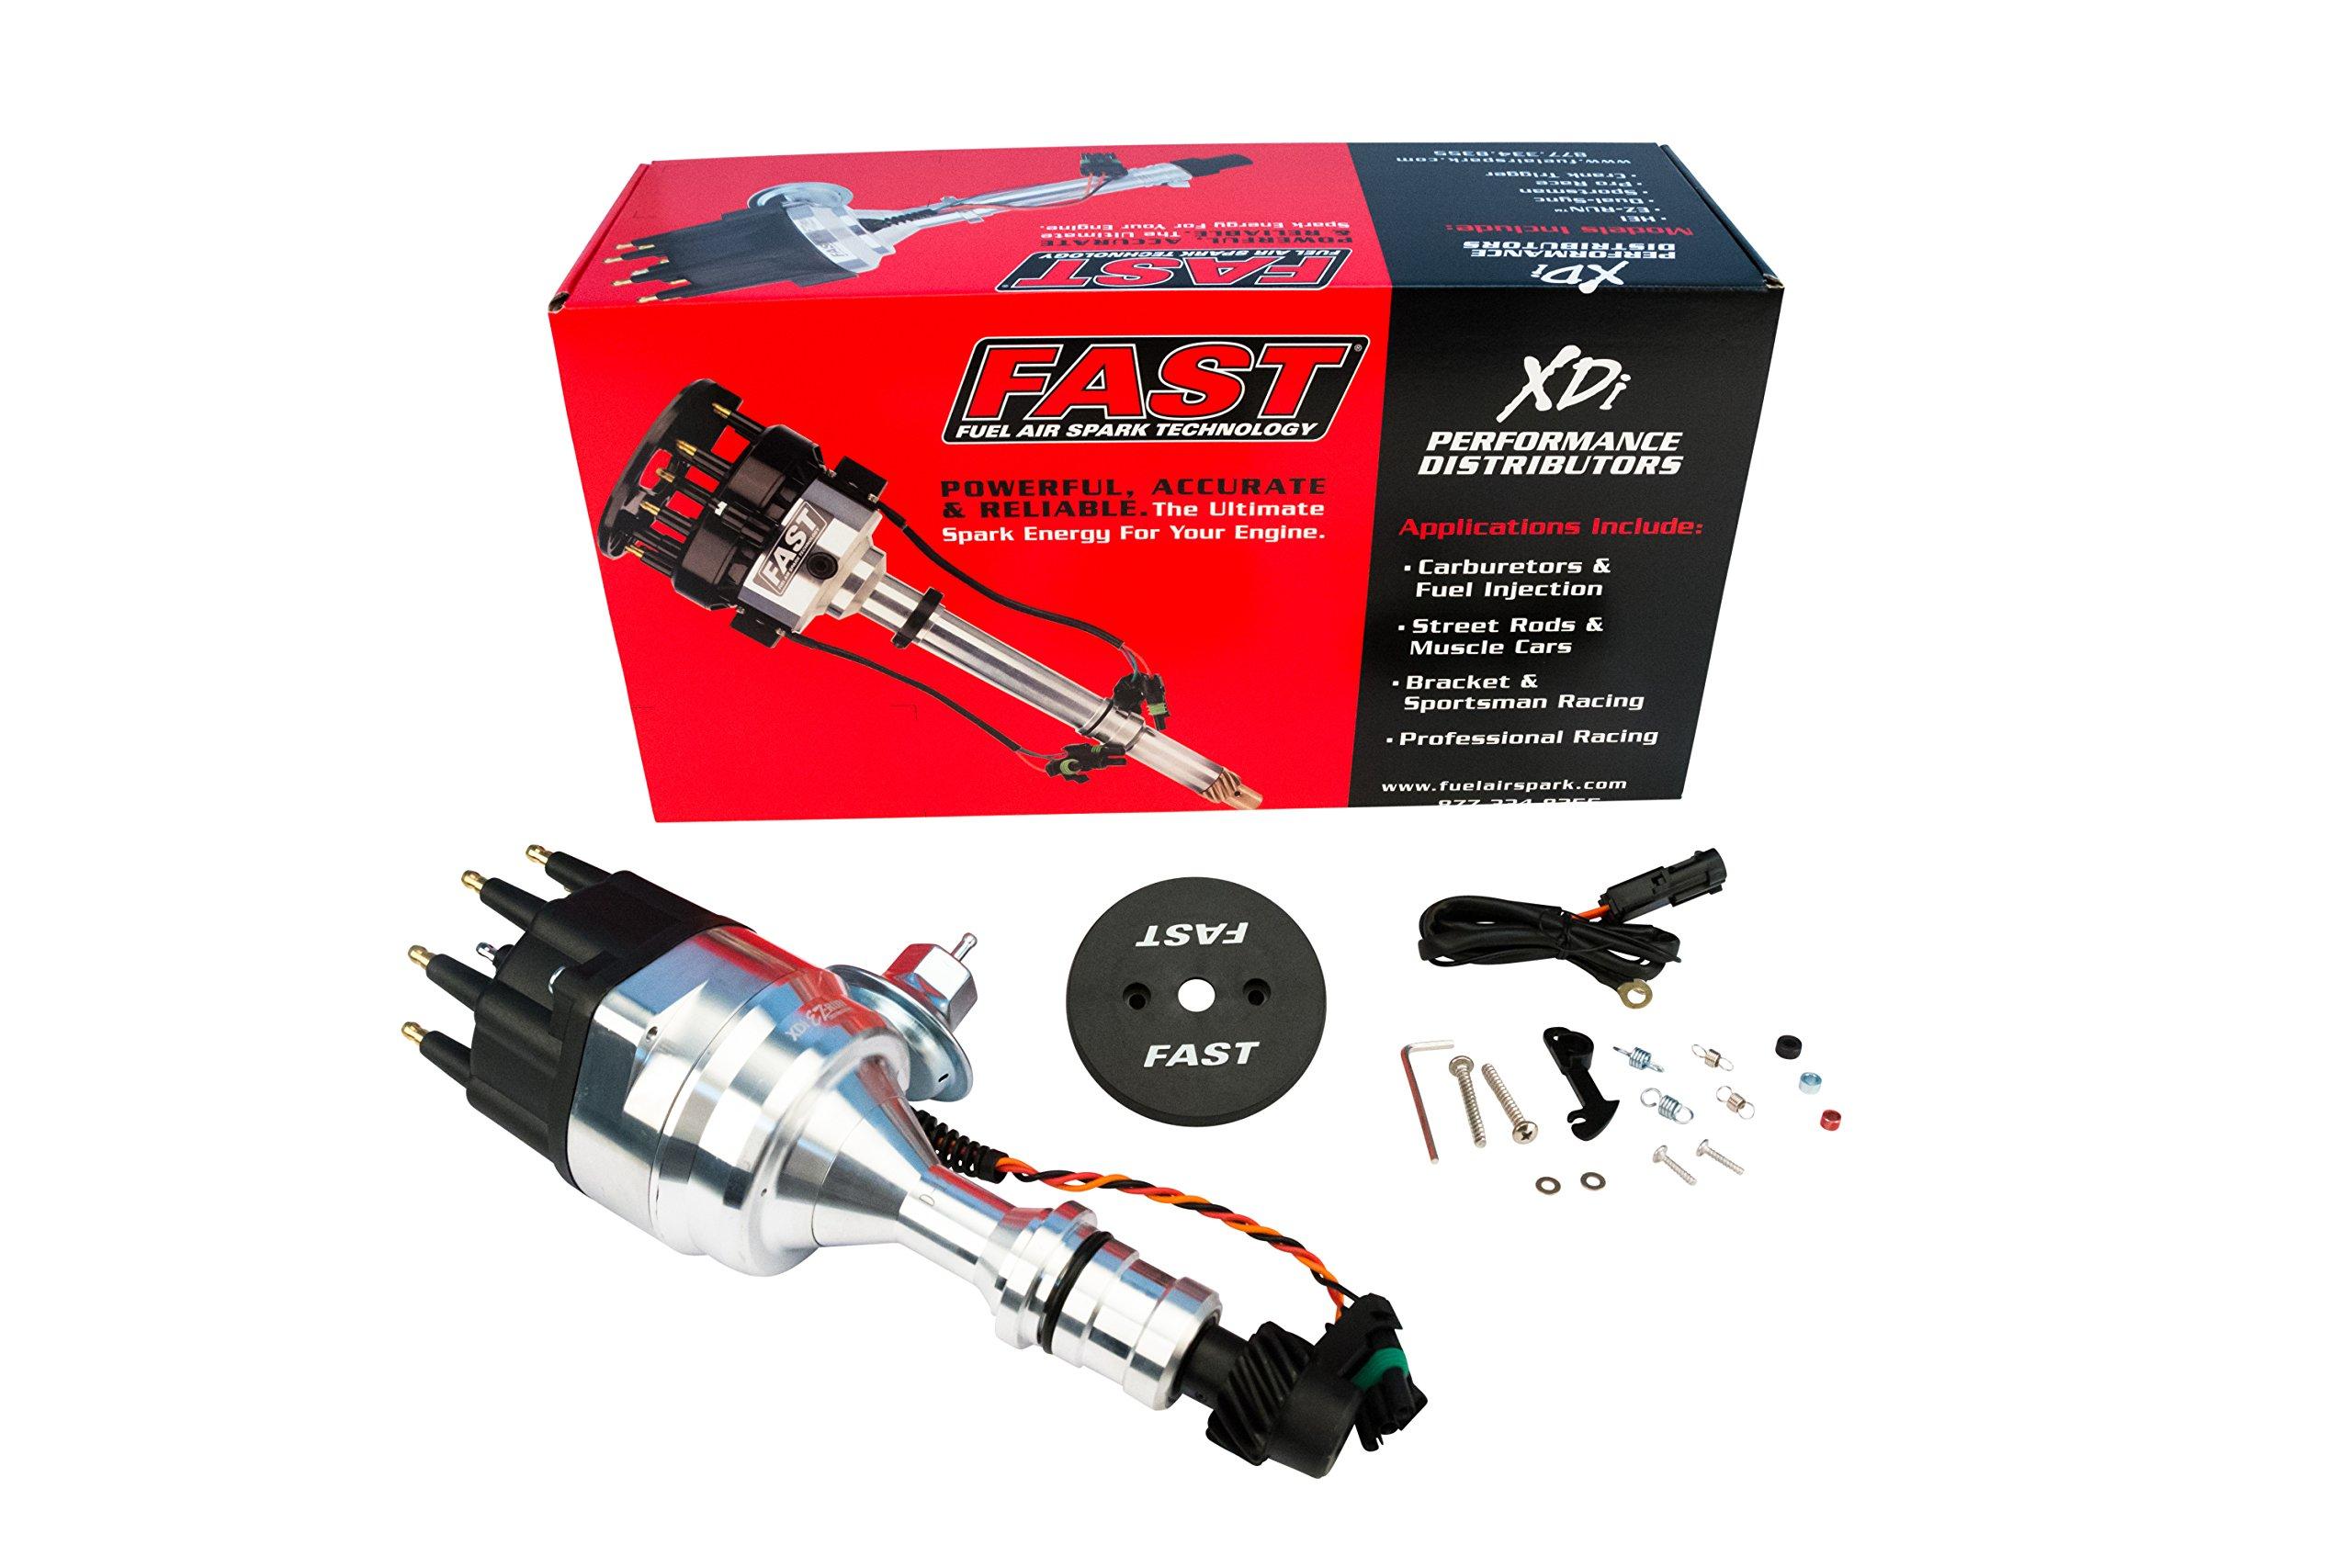 Fast 306018 XDI EZ-Run DistributorOlds V8 260-455 by FAST (Image #2)